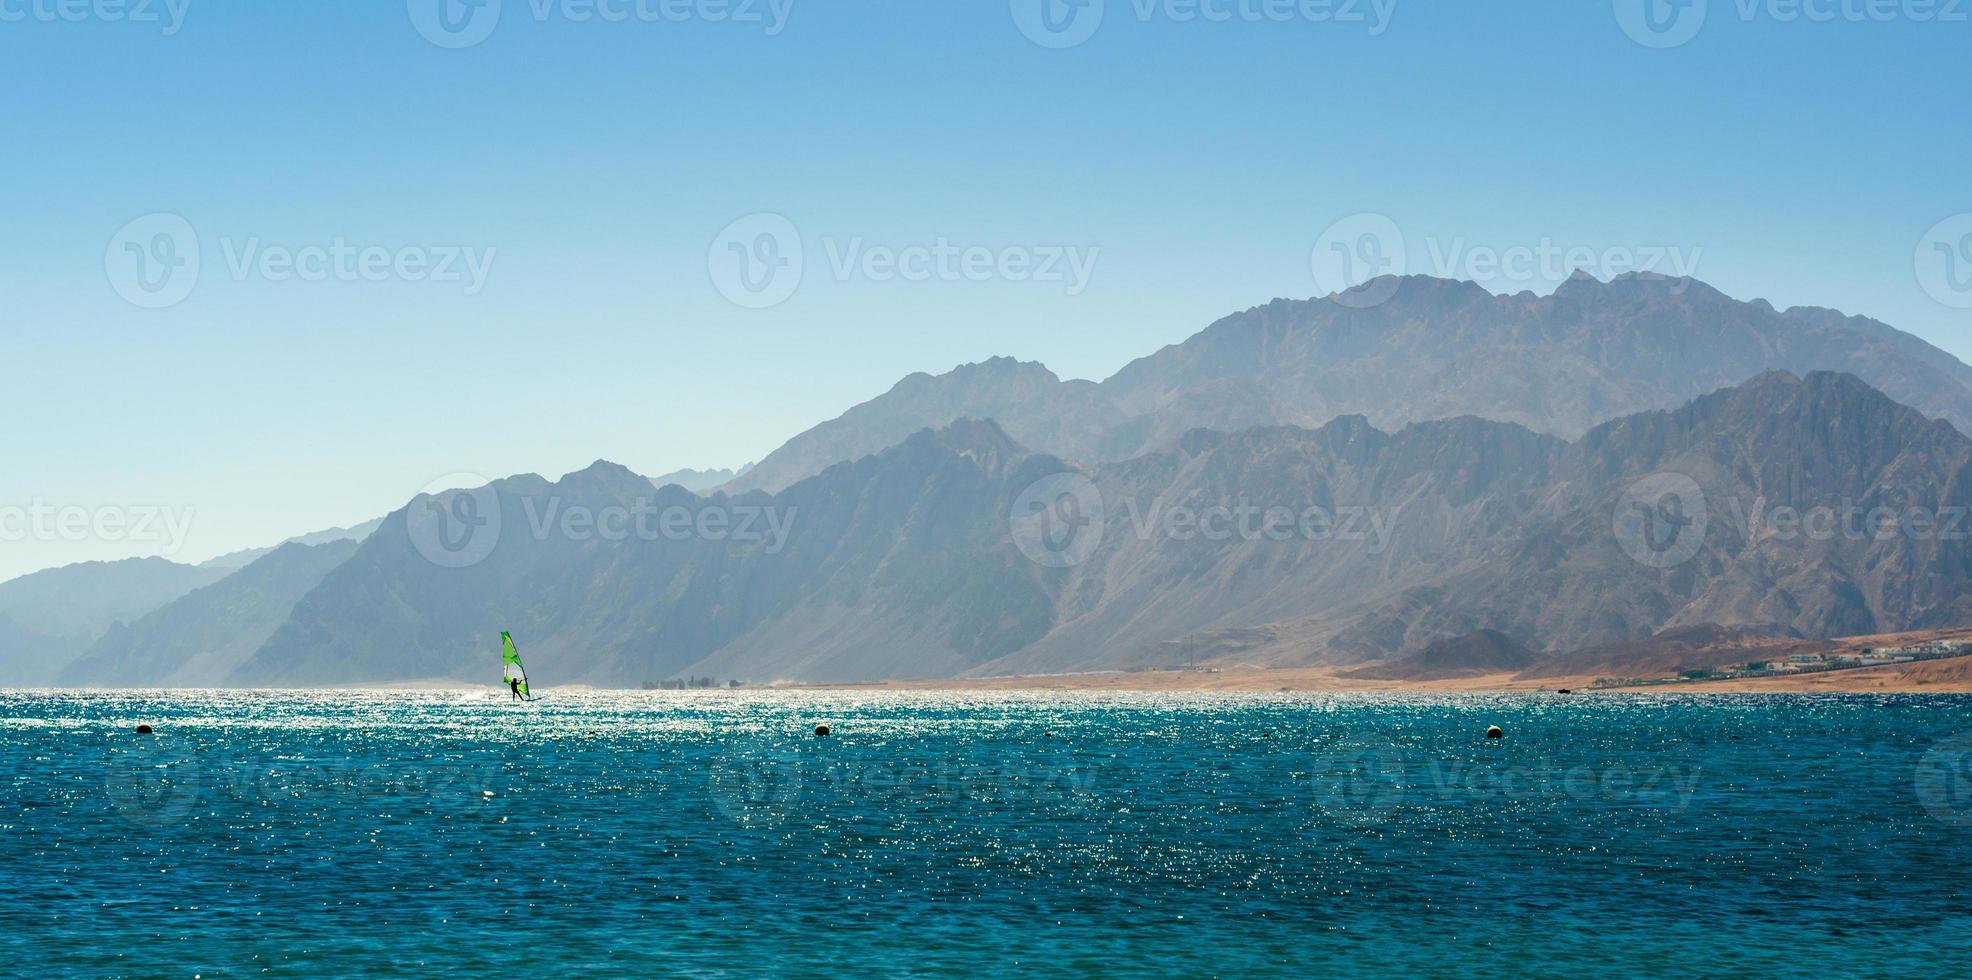 felsige Berge in der Nähe des Meeres foto